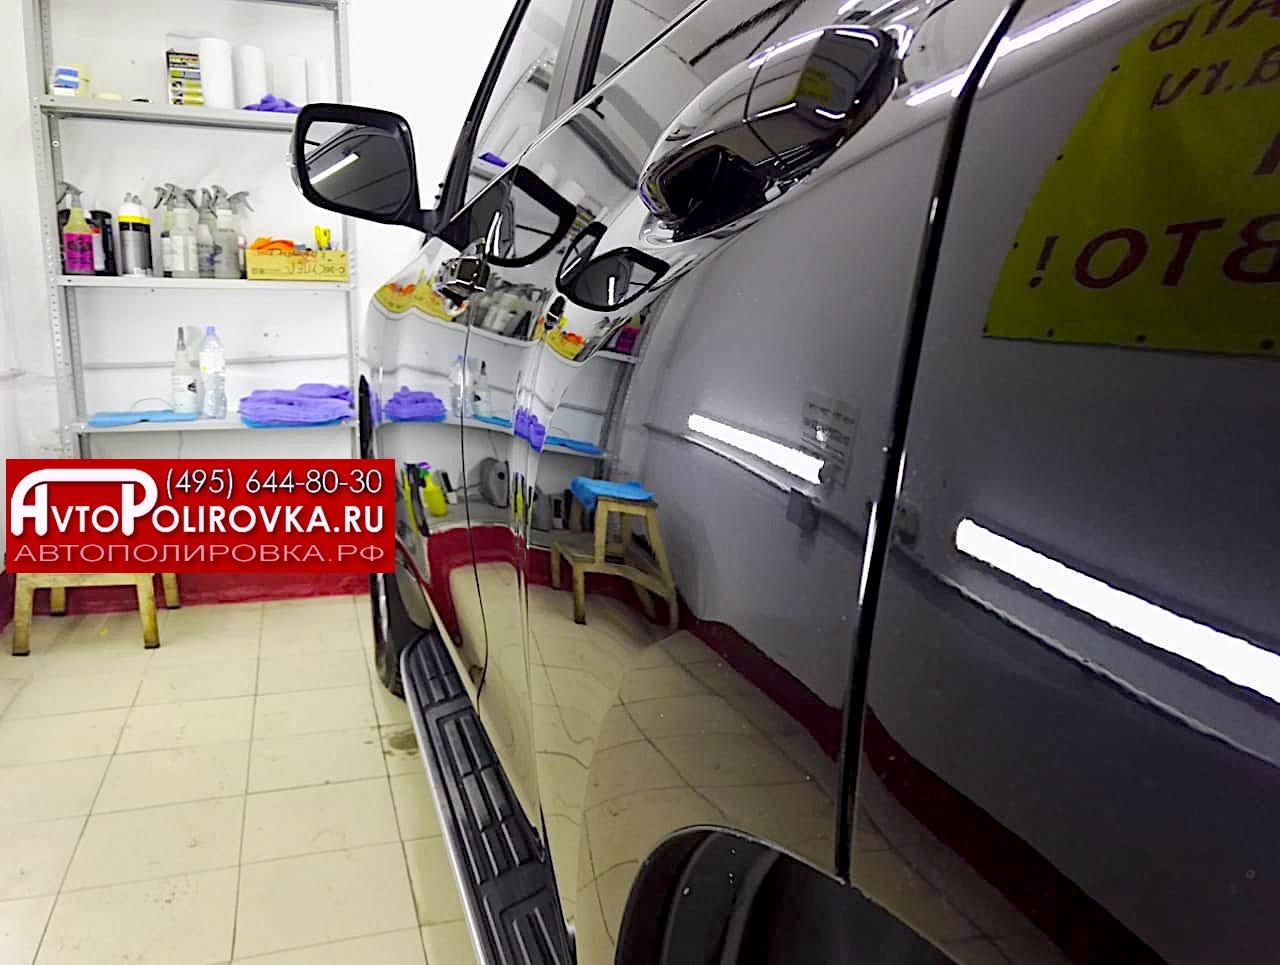 https://www.avtopolirovka.ru/images/New2019/prado20192.jpg